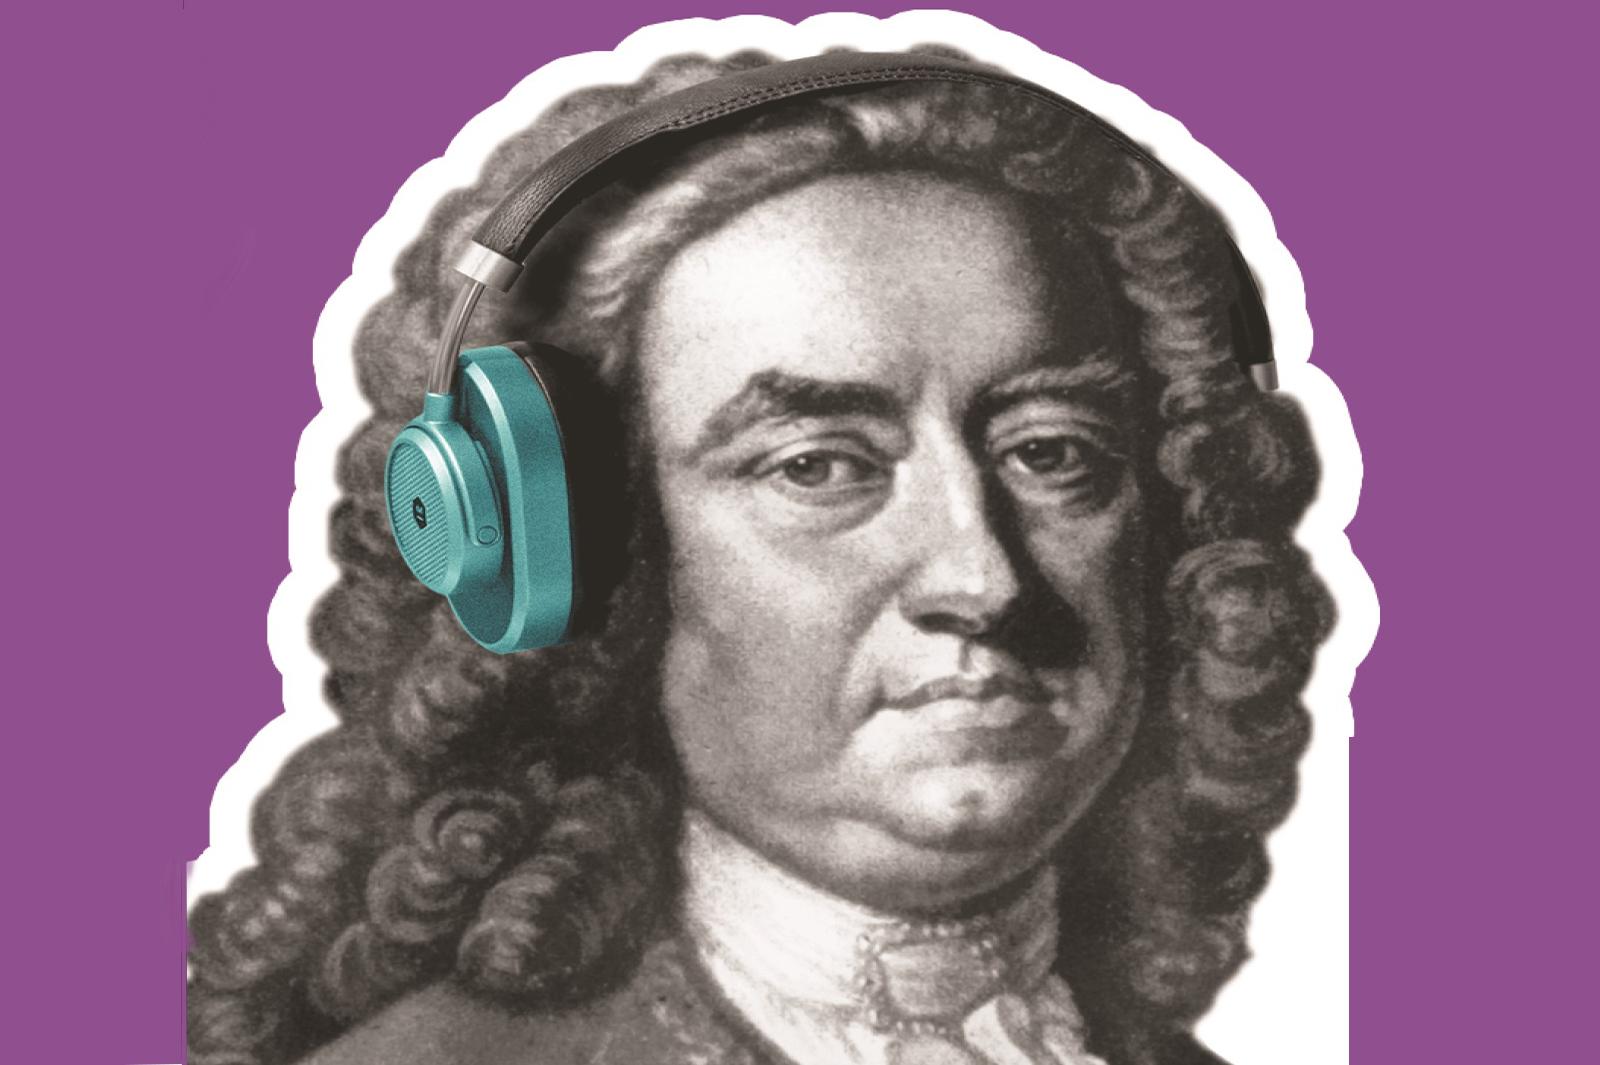 Beau Nash with headphones for the Tales of Tunbridge Wells audio tour app